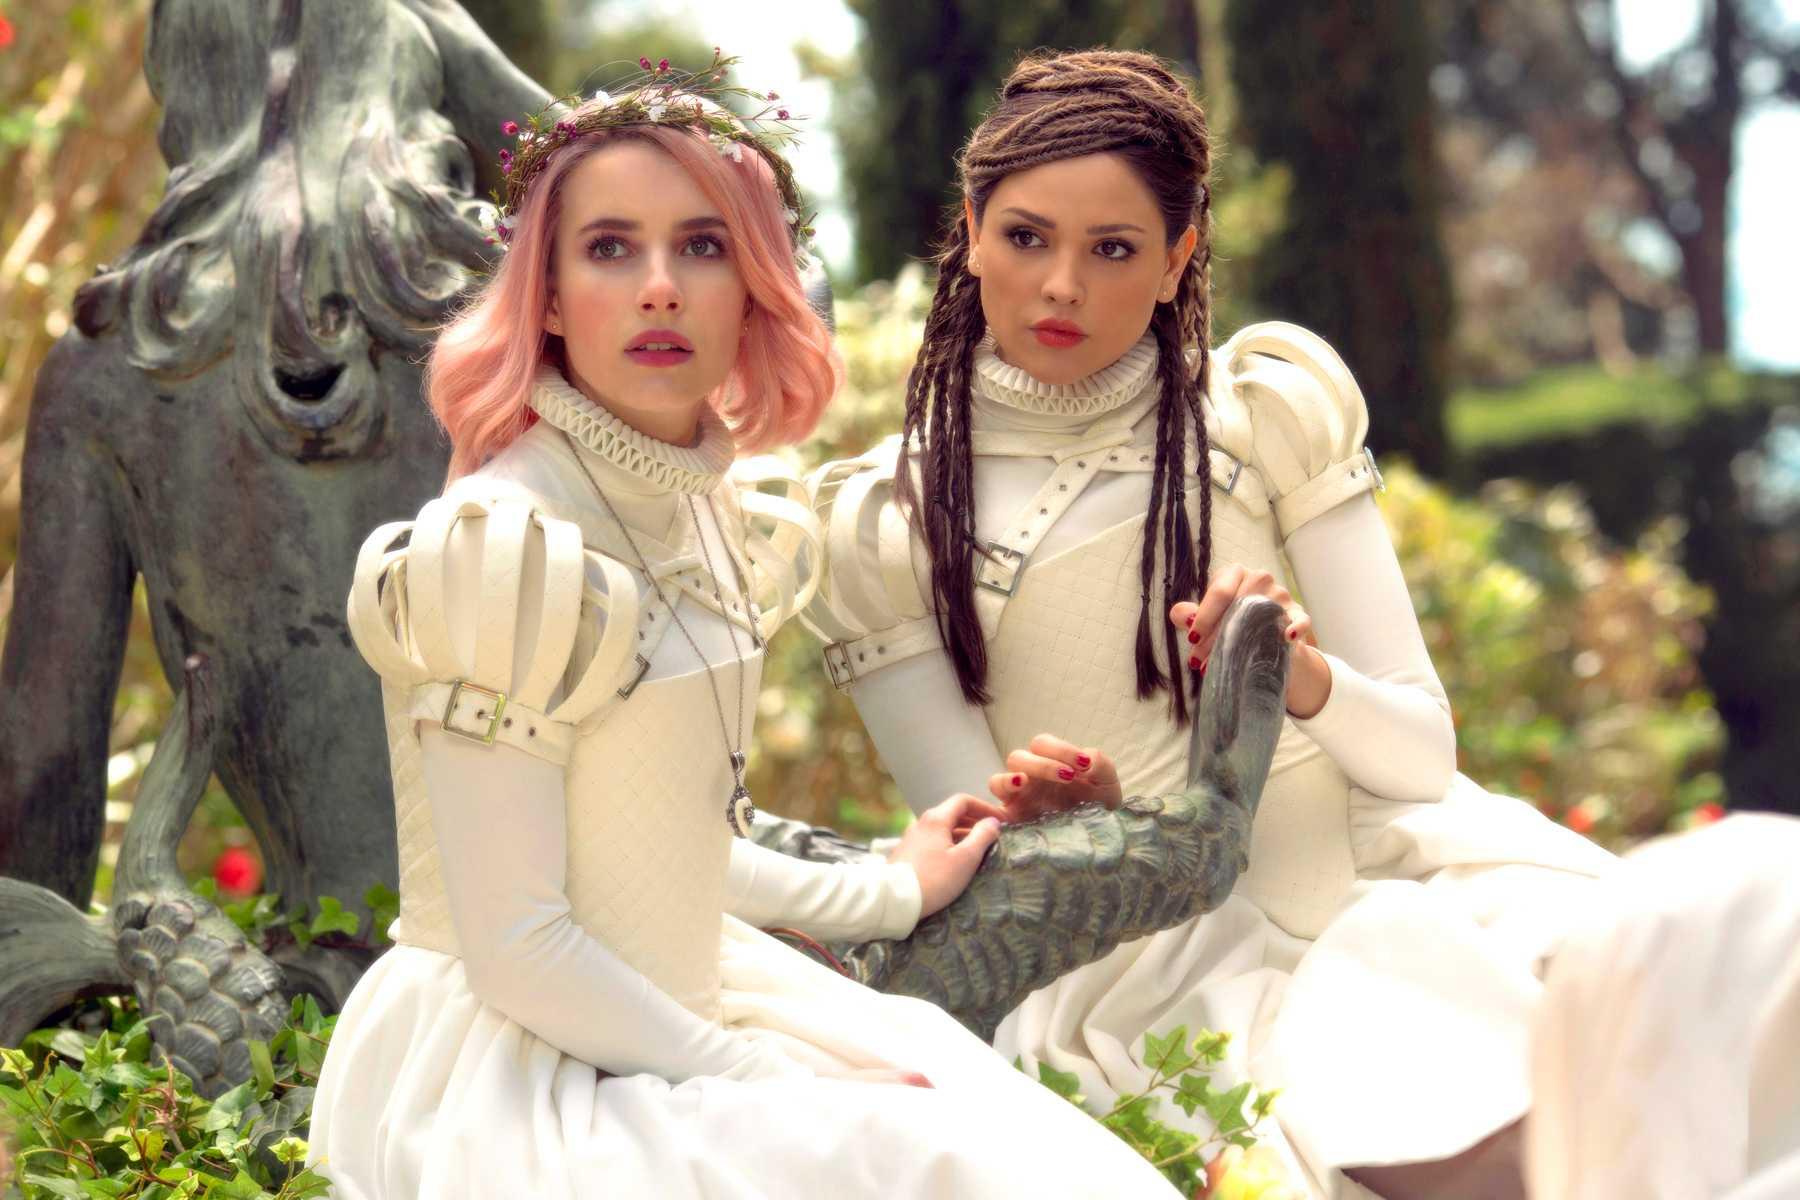 Emma Roberts and Eiza Gonzalez in